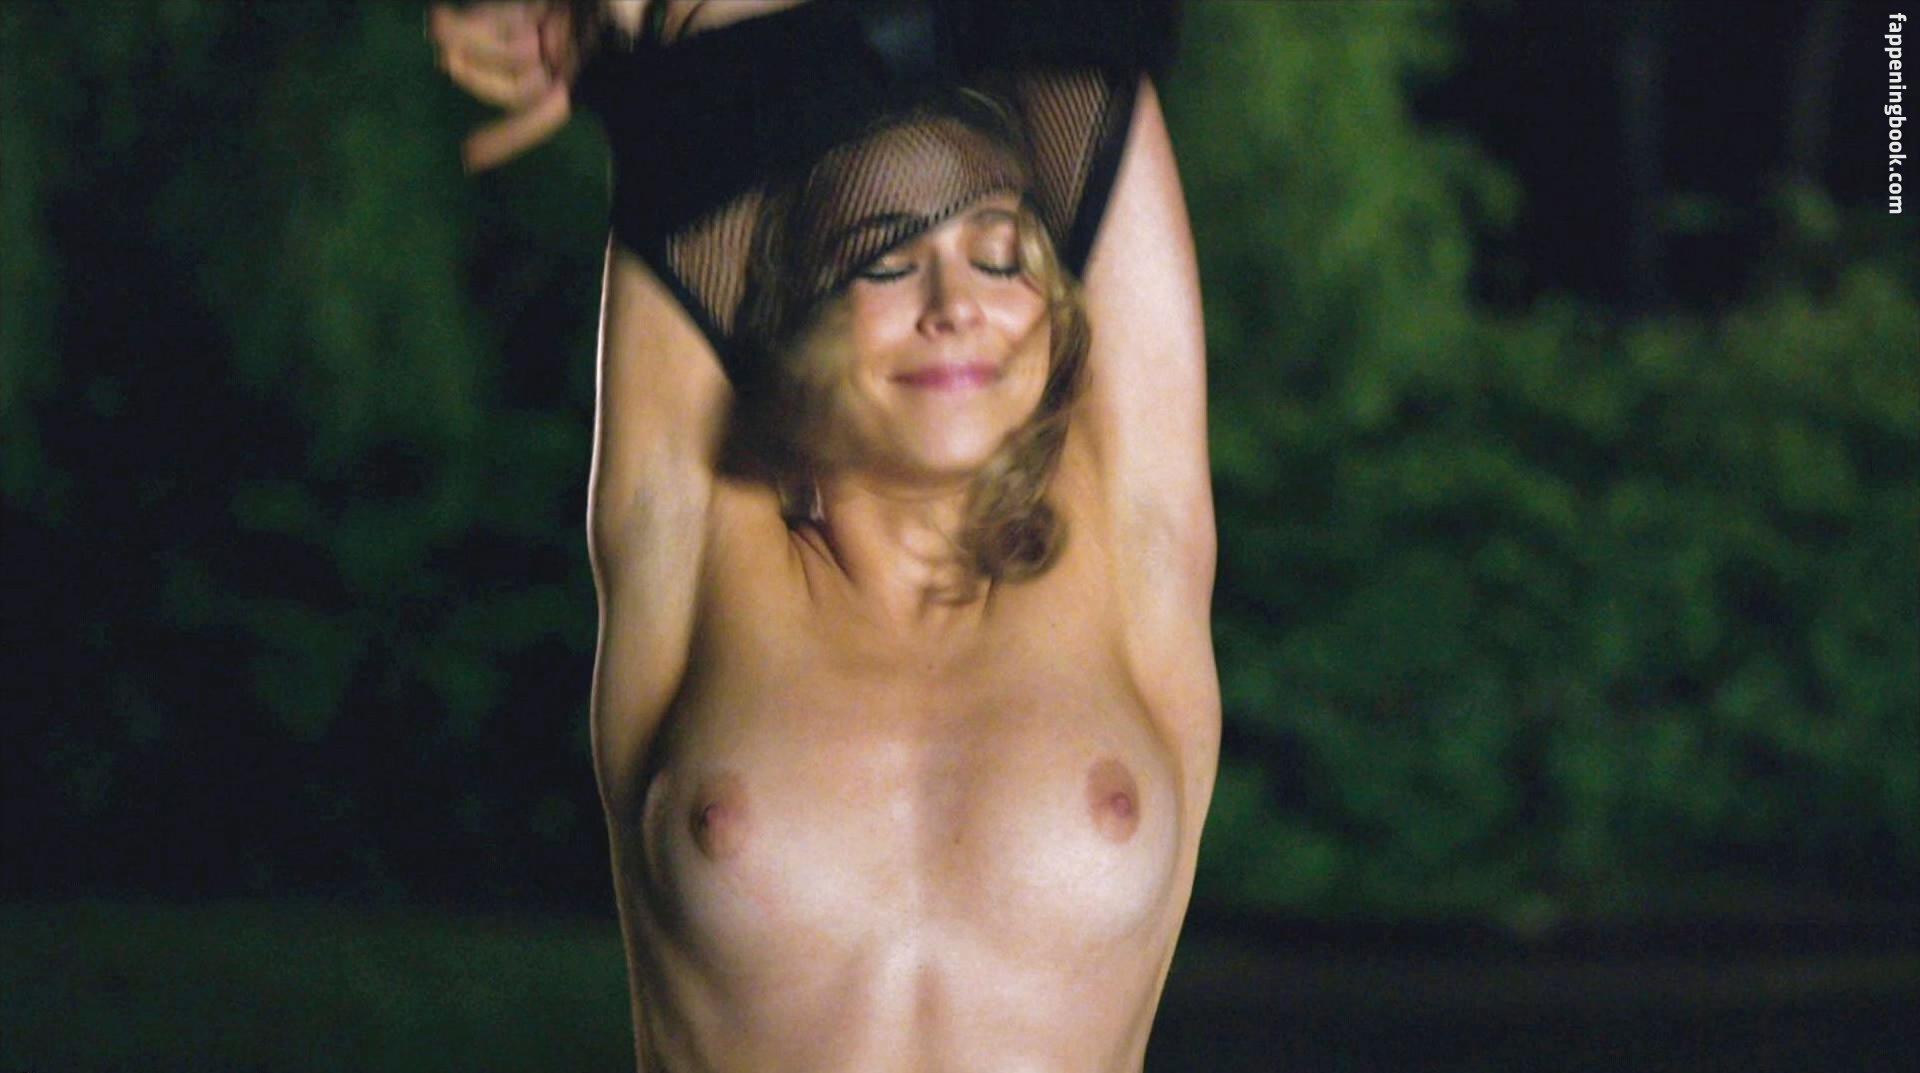 Sophia bush nudes galleries